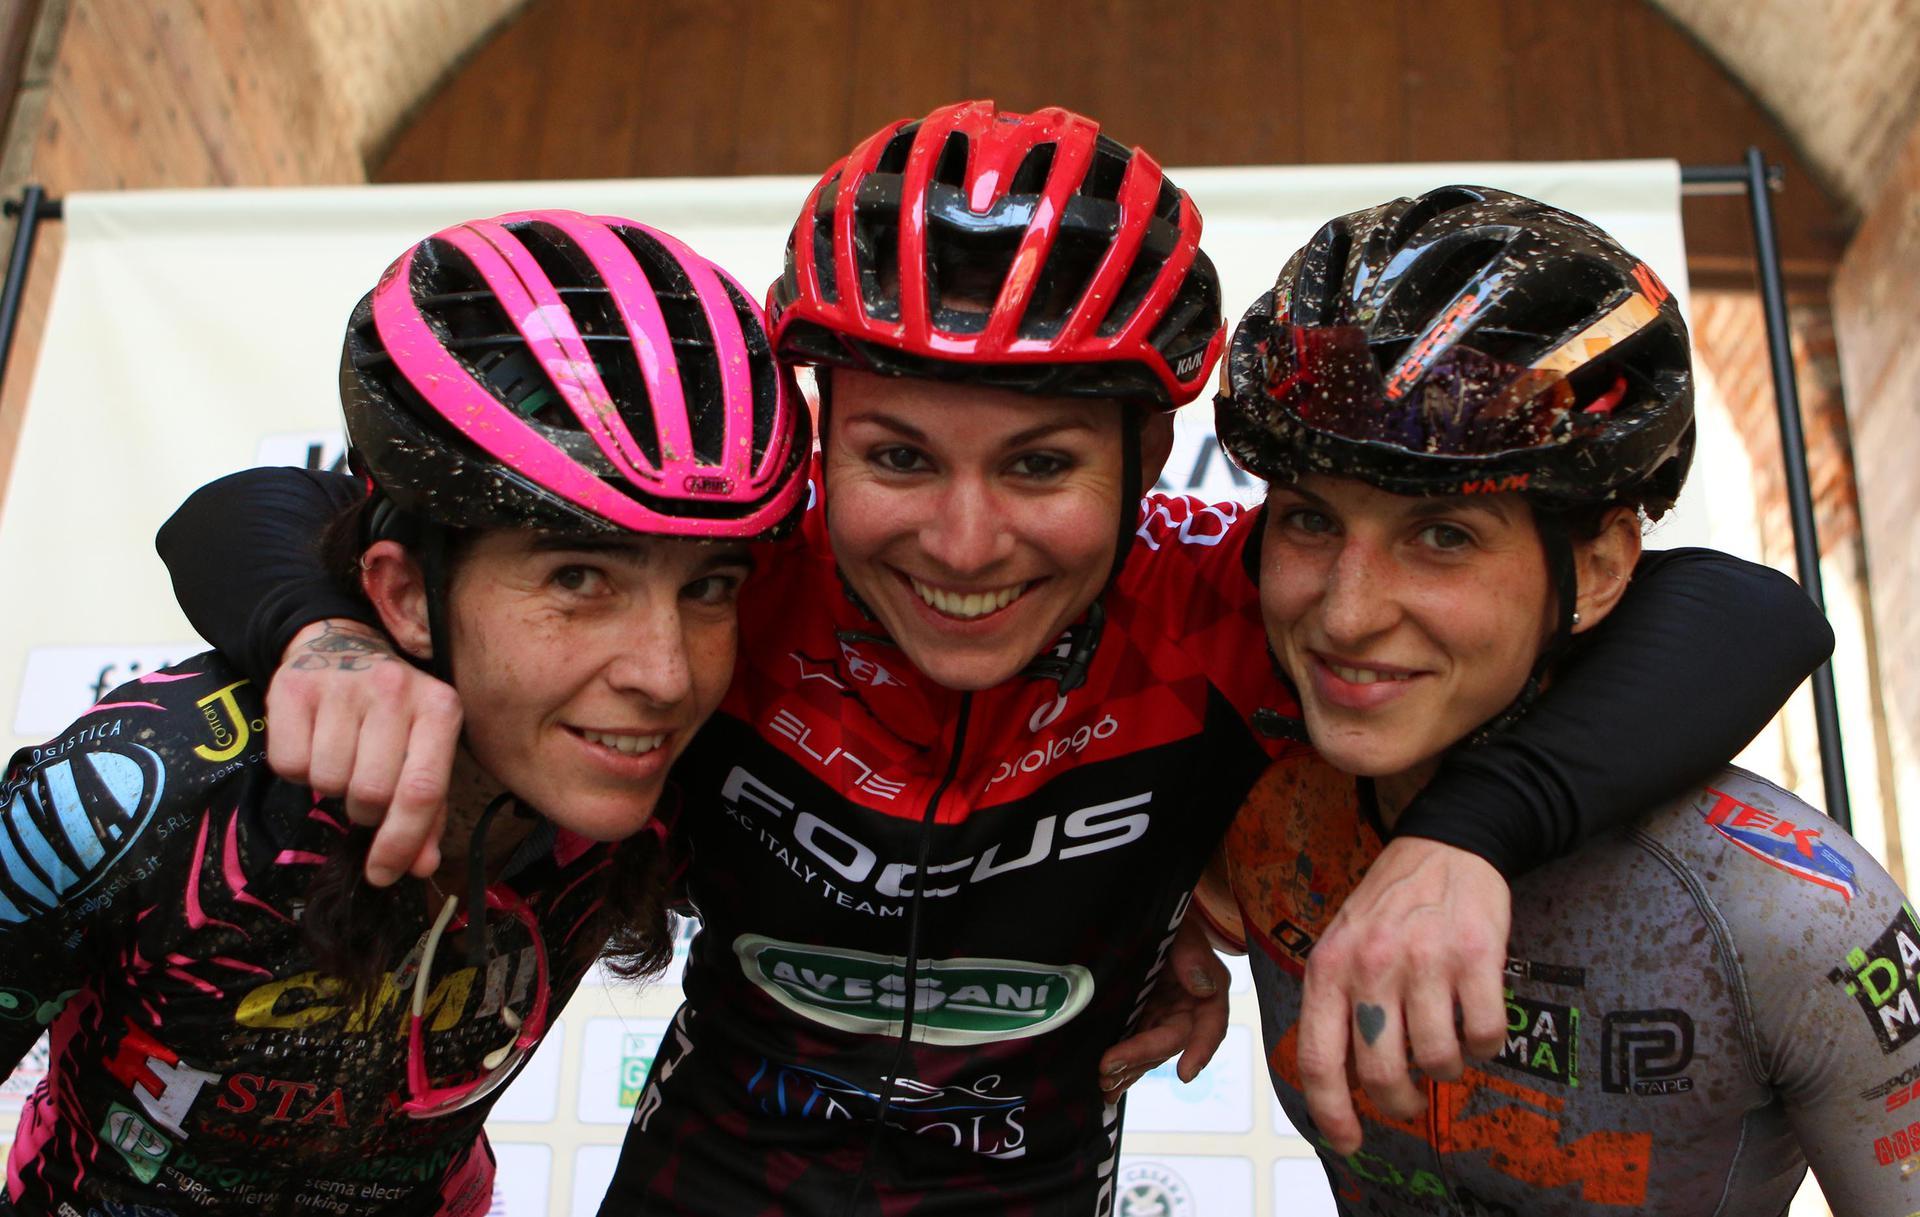 Da sinistra a destra: Simona Mazzucotelli, Mara Fumagalli, Gaia Ravaioli.